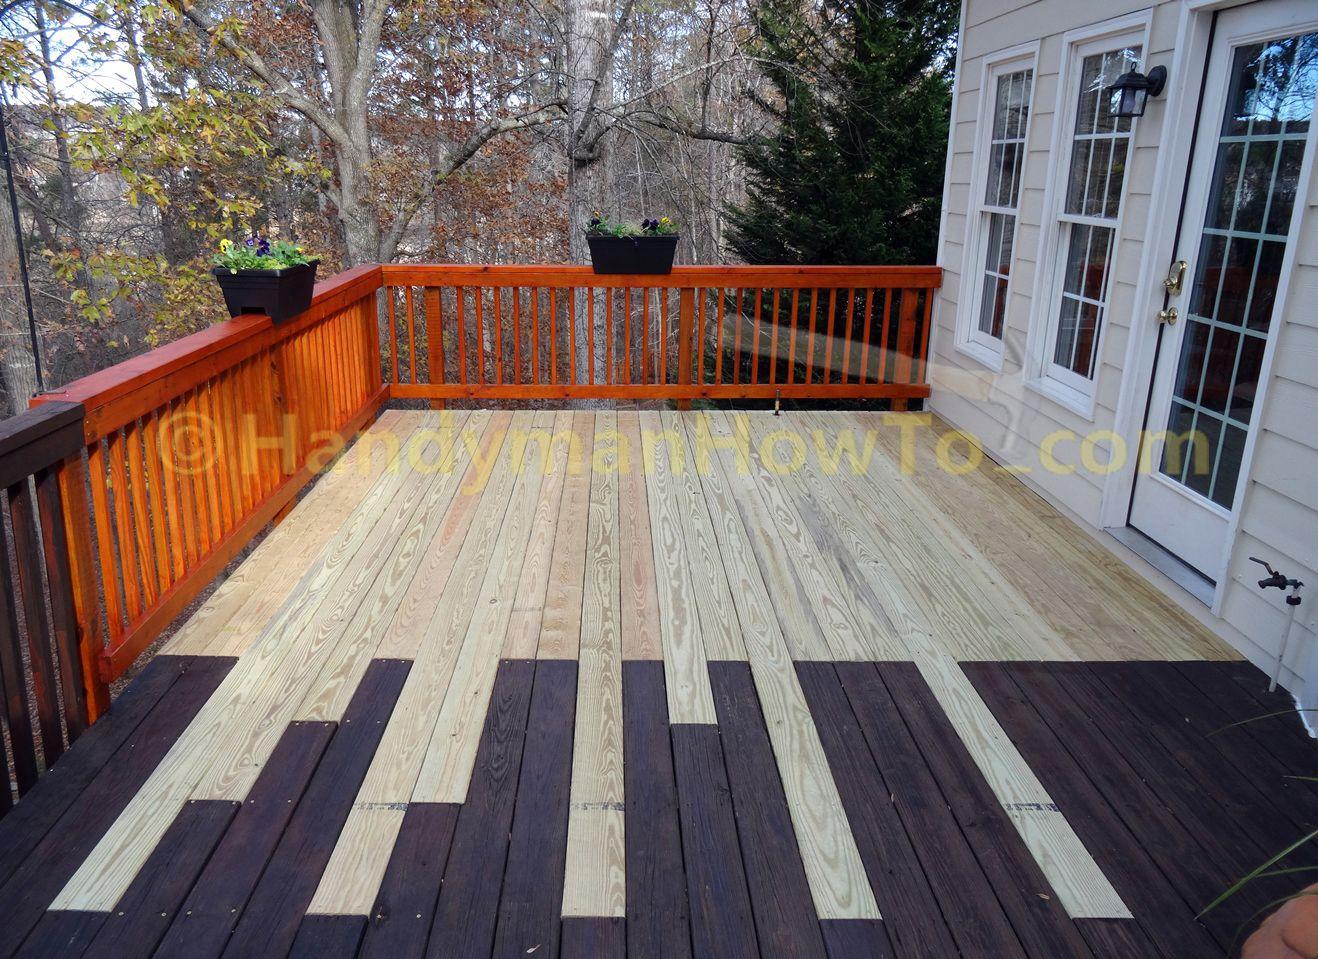 Sagging deck repair rebuilt deck rail and deck boards deck how to replace wood deck boards baanklon Images